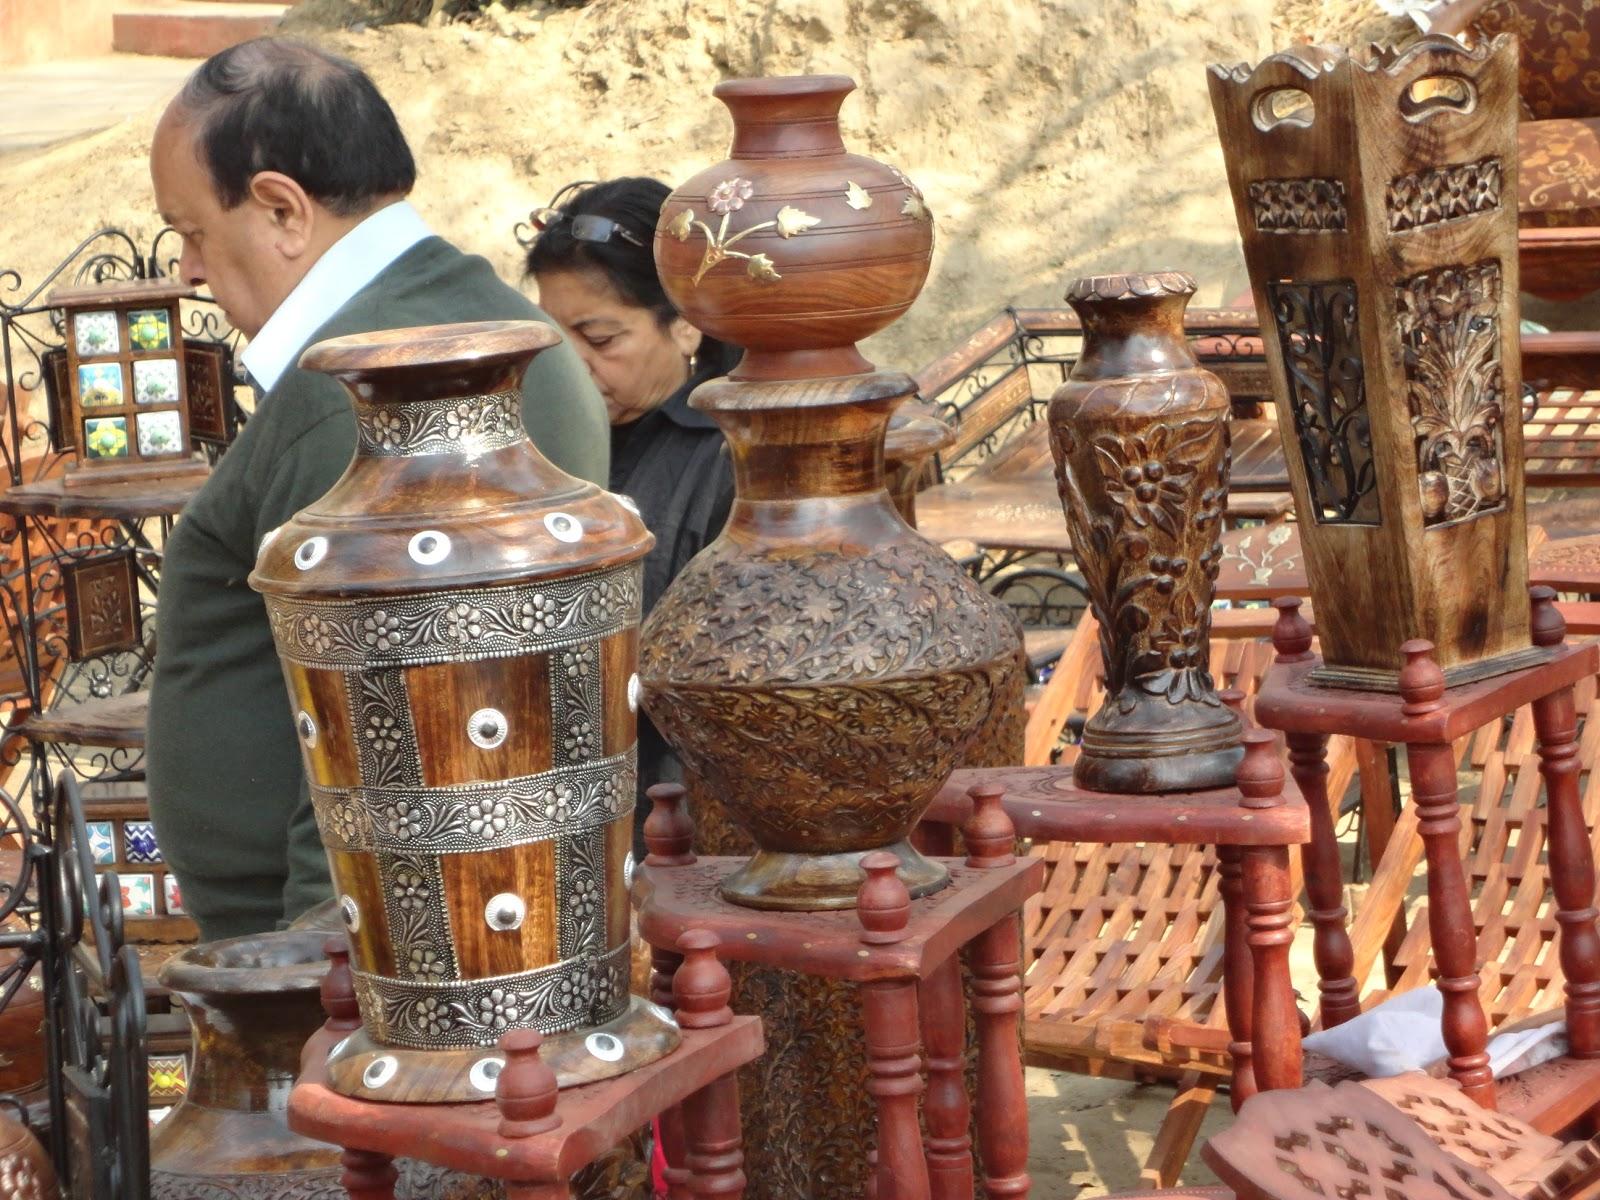 Woodwork Crafts at Surajkund Mela,India